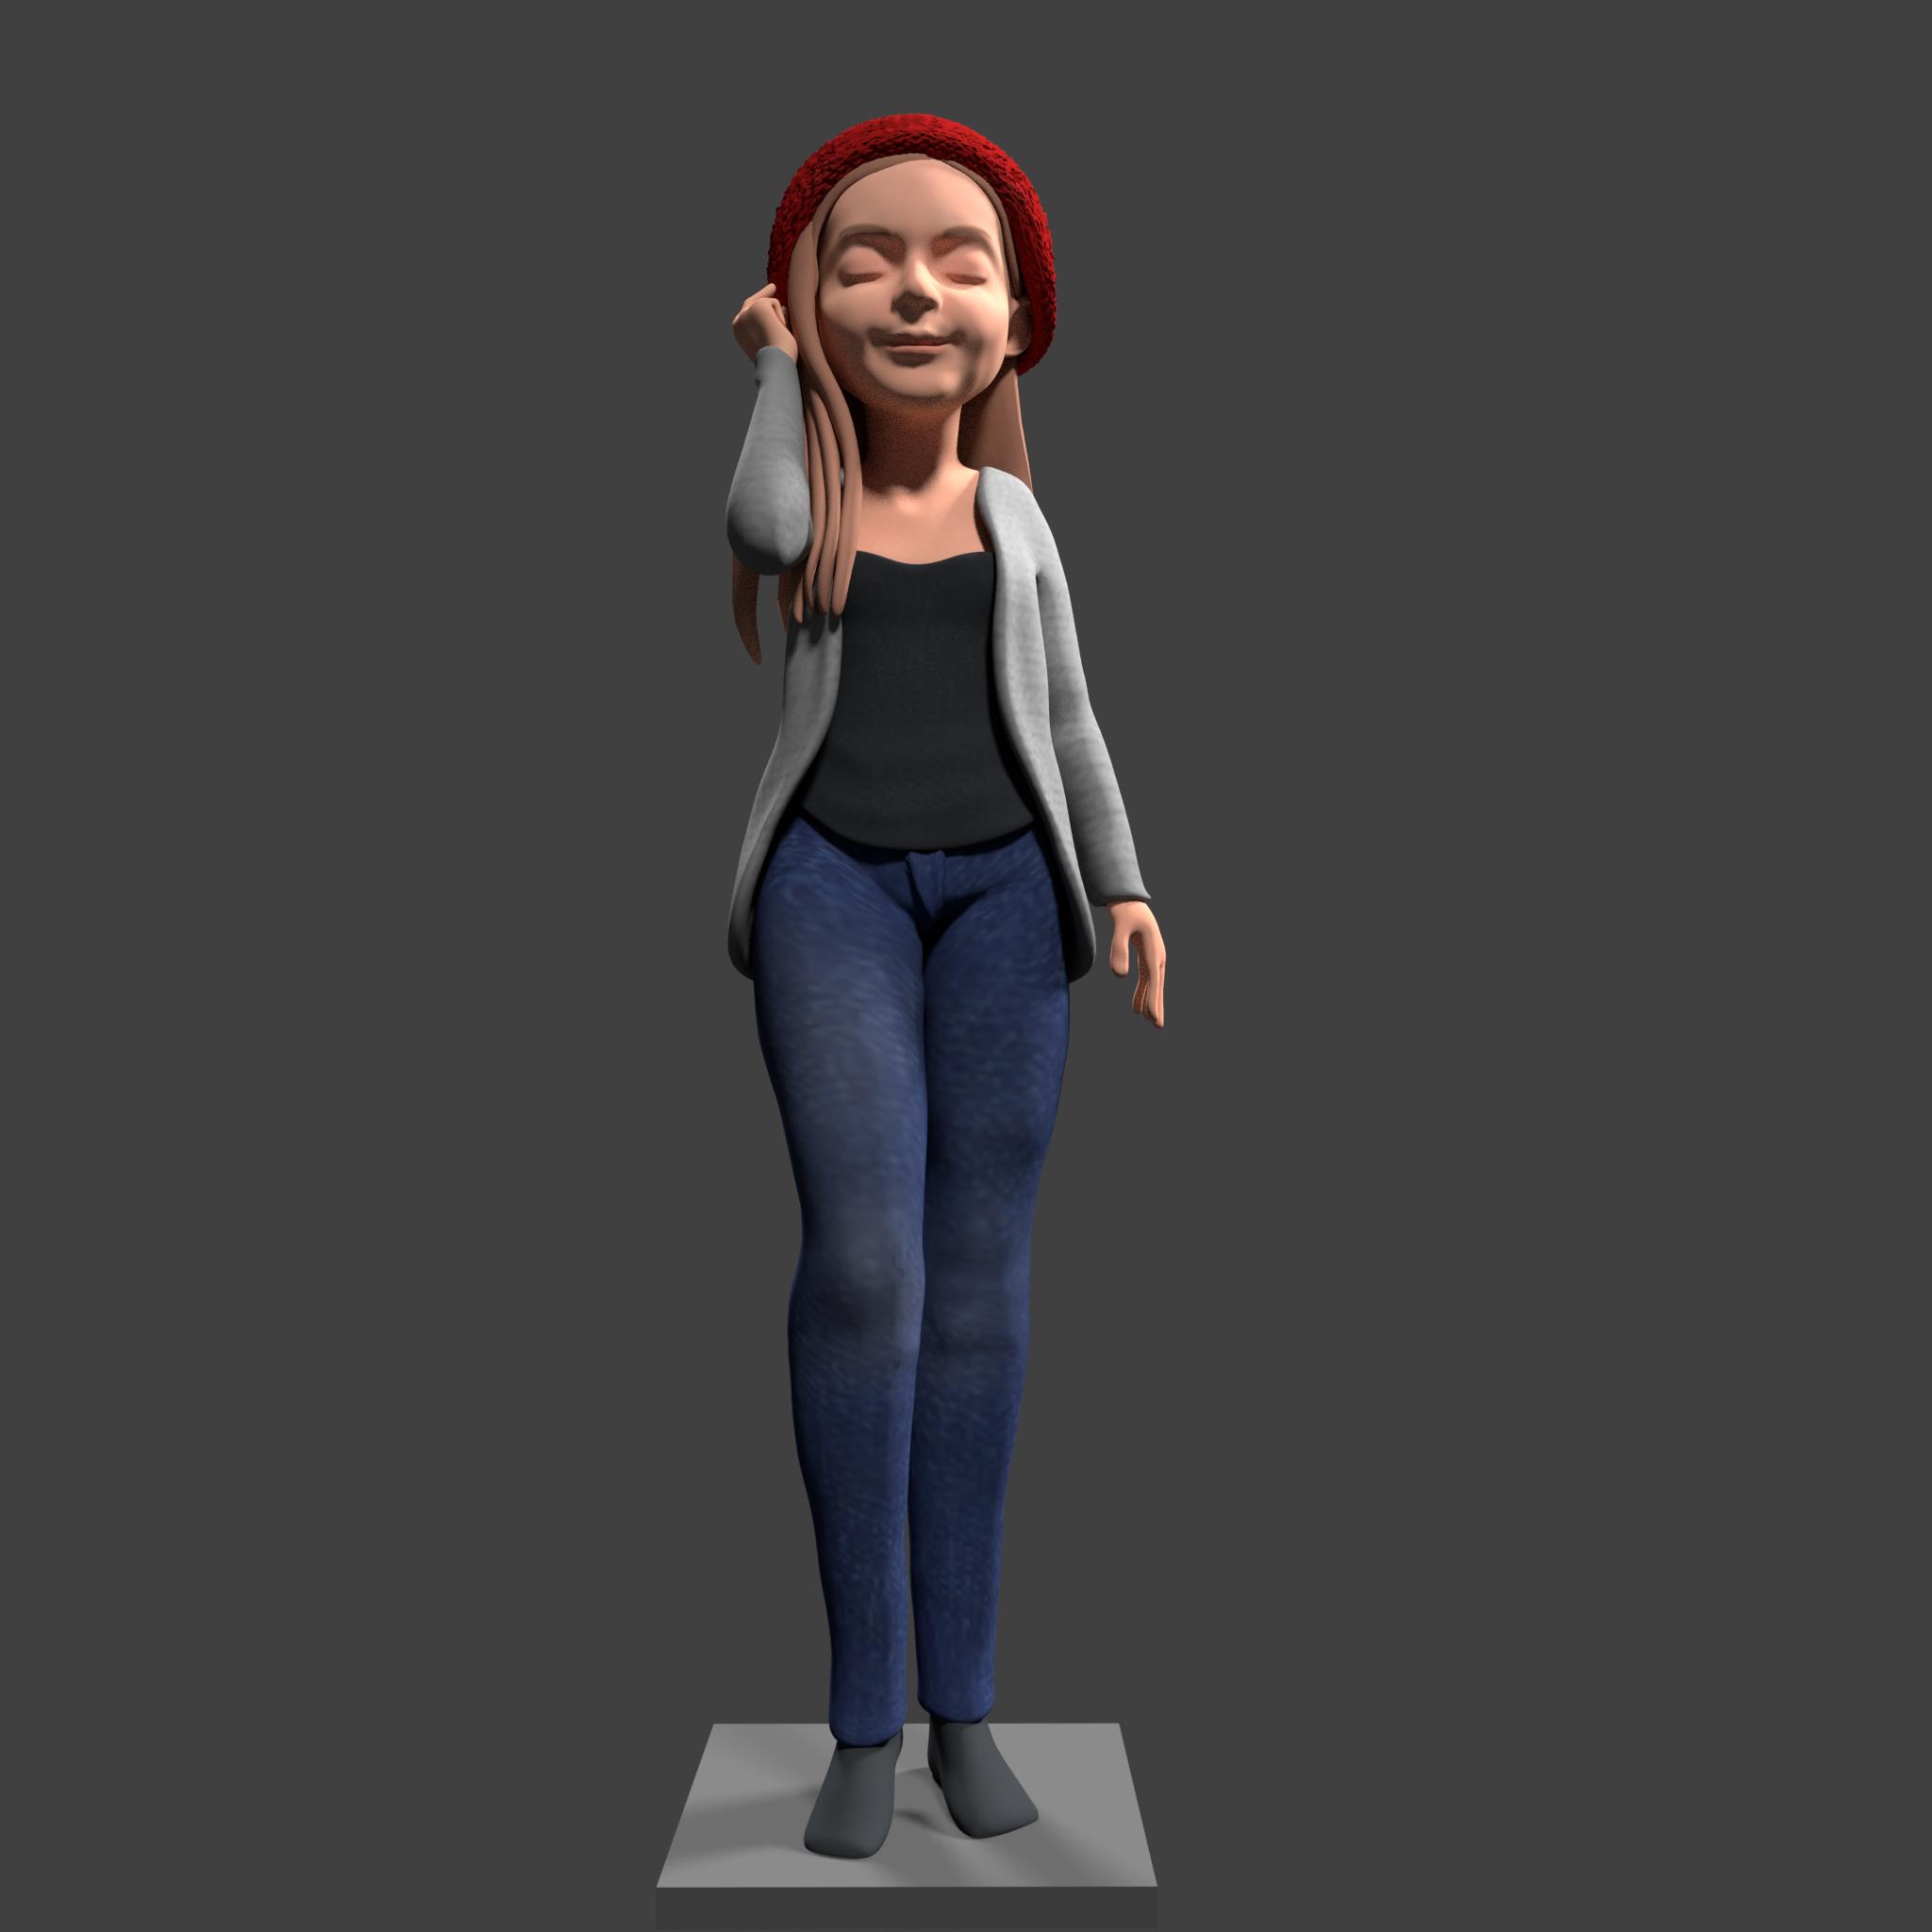 CUTE CHARACTER 3D CARTOON FOR 3D PRINT.3D CHACARTER ANIMATION